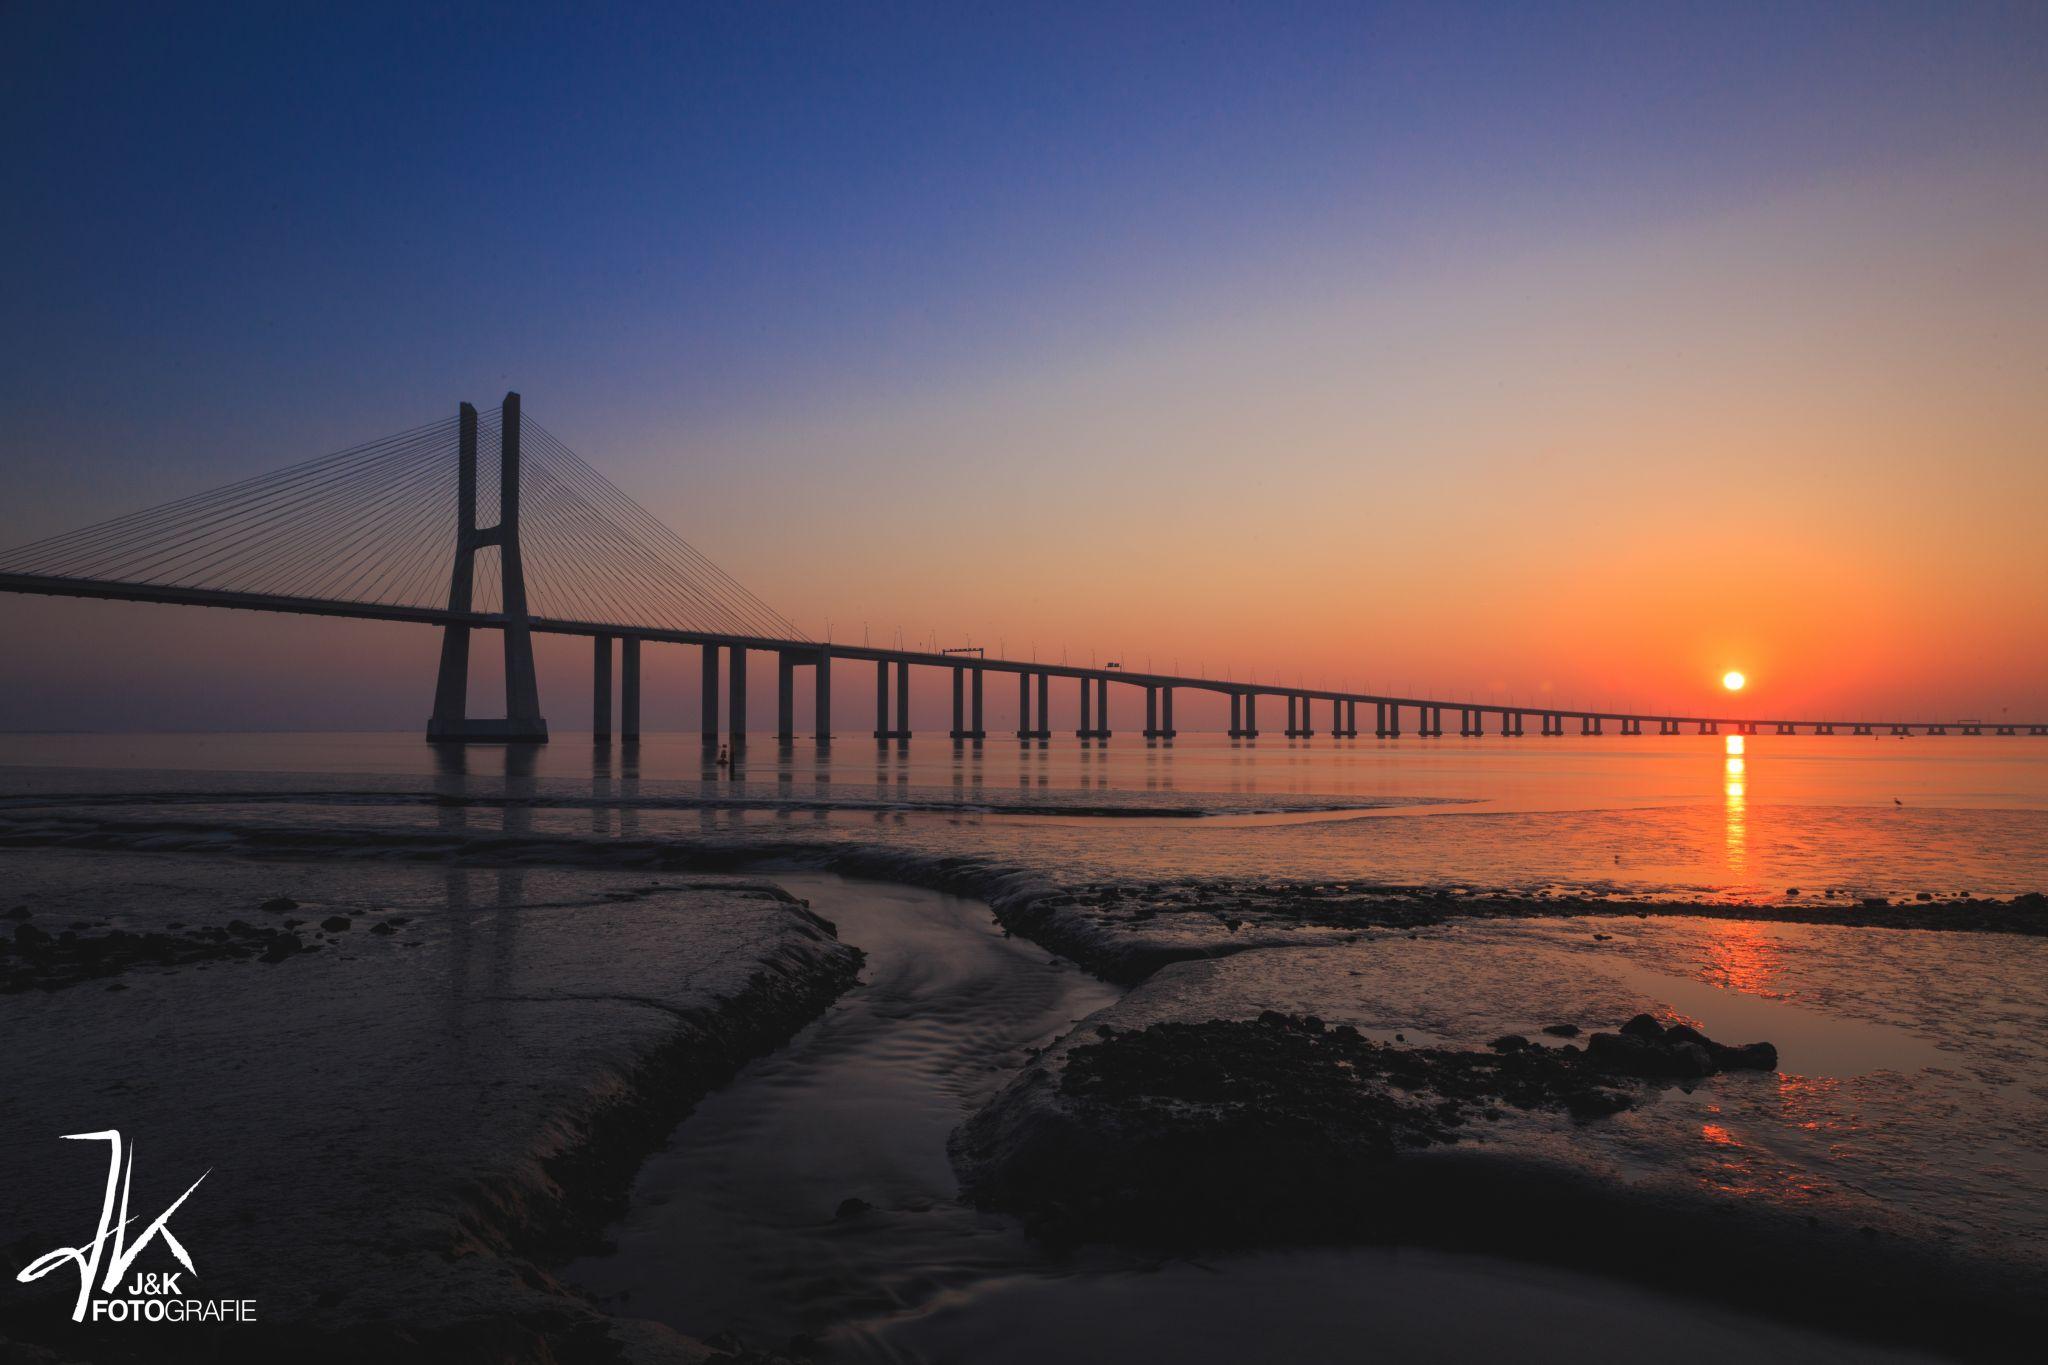 Ponte Vasco da Gamma, Portugal